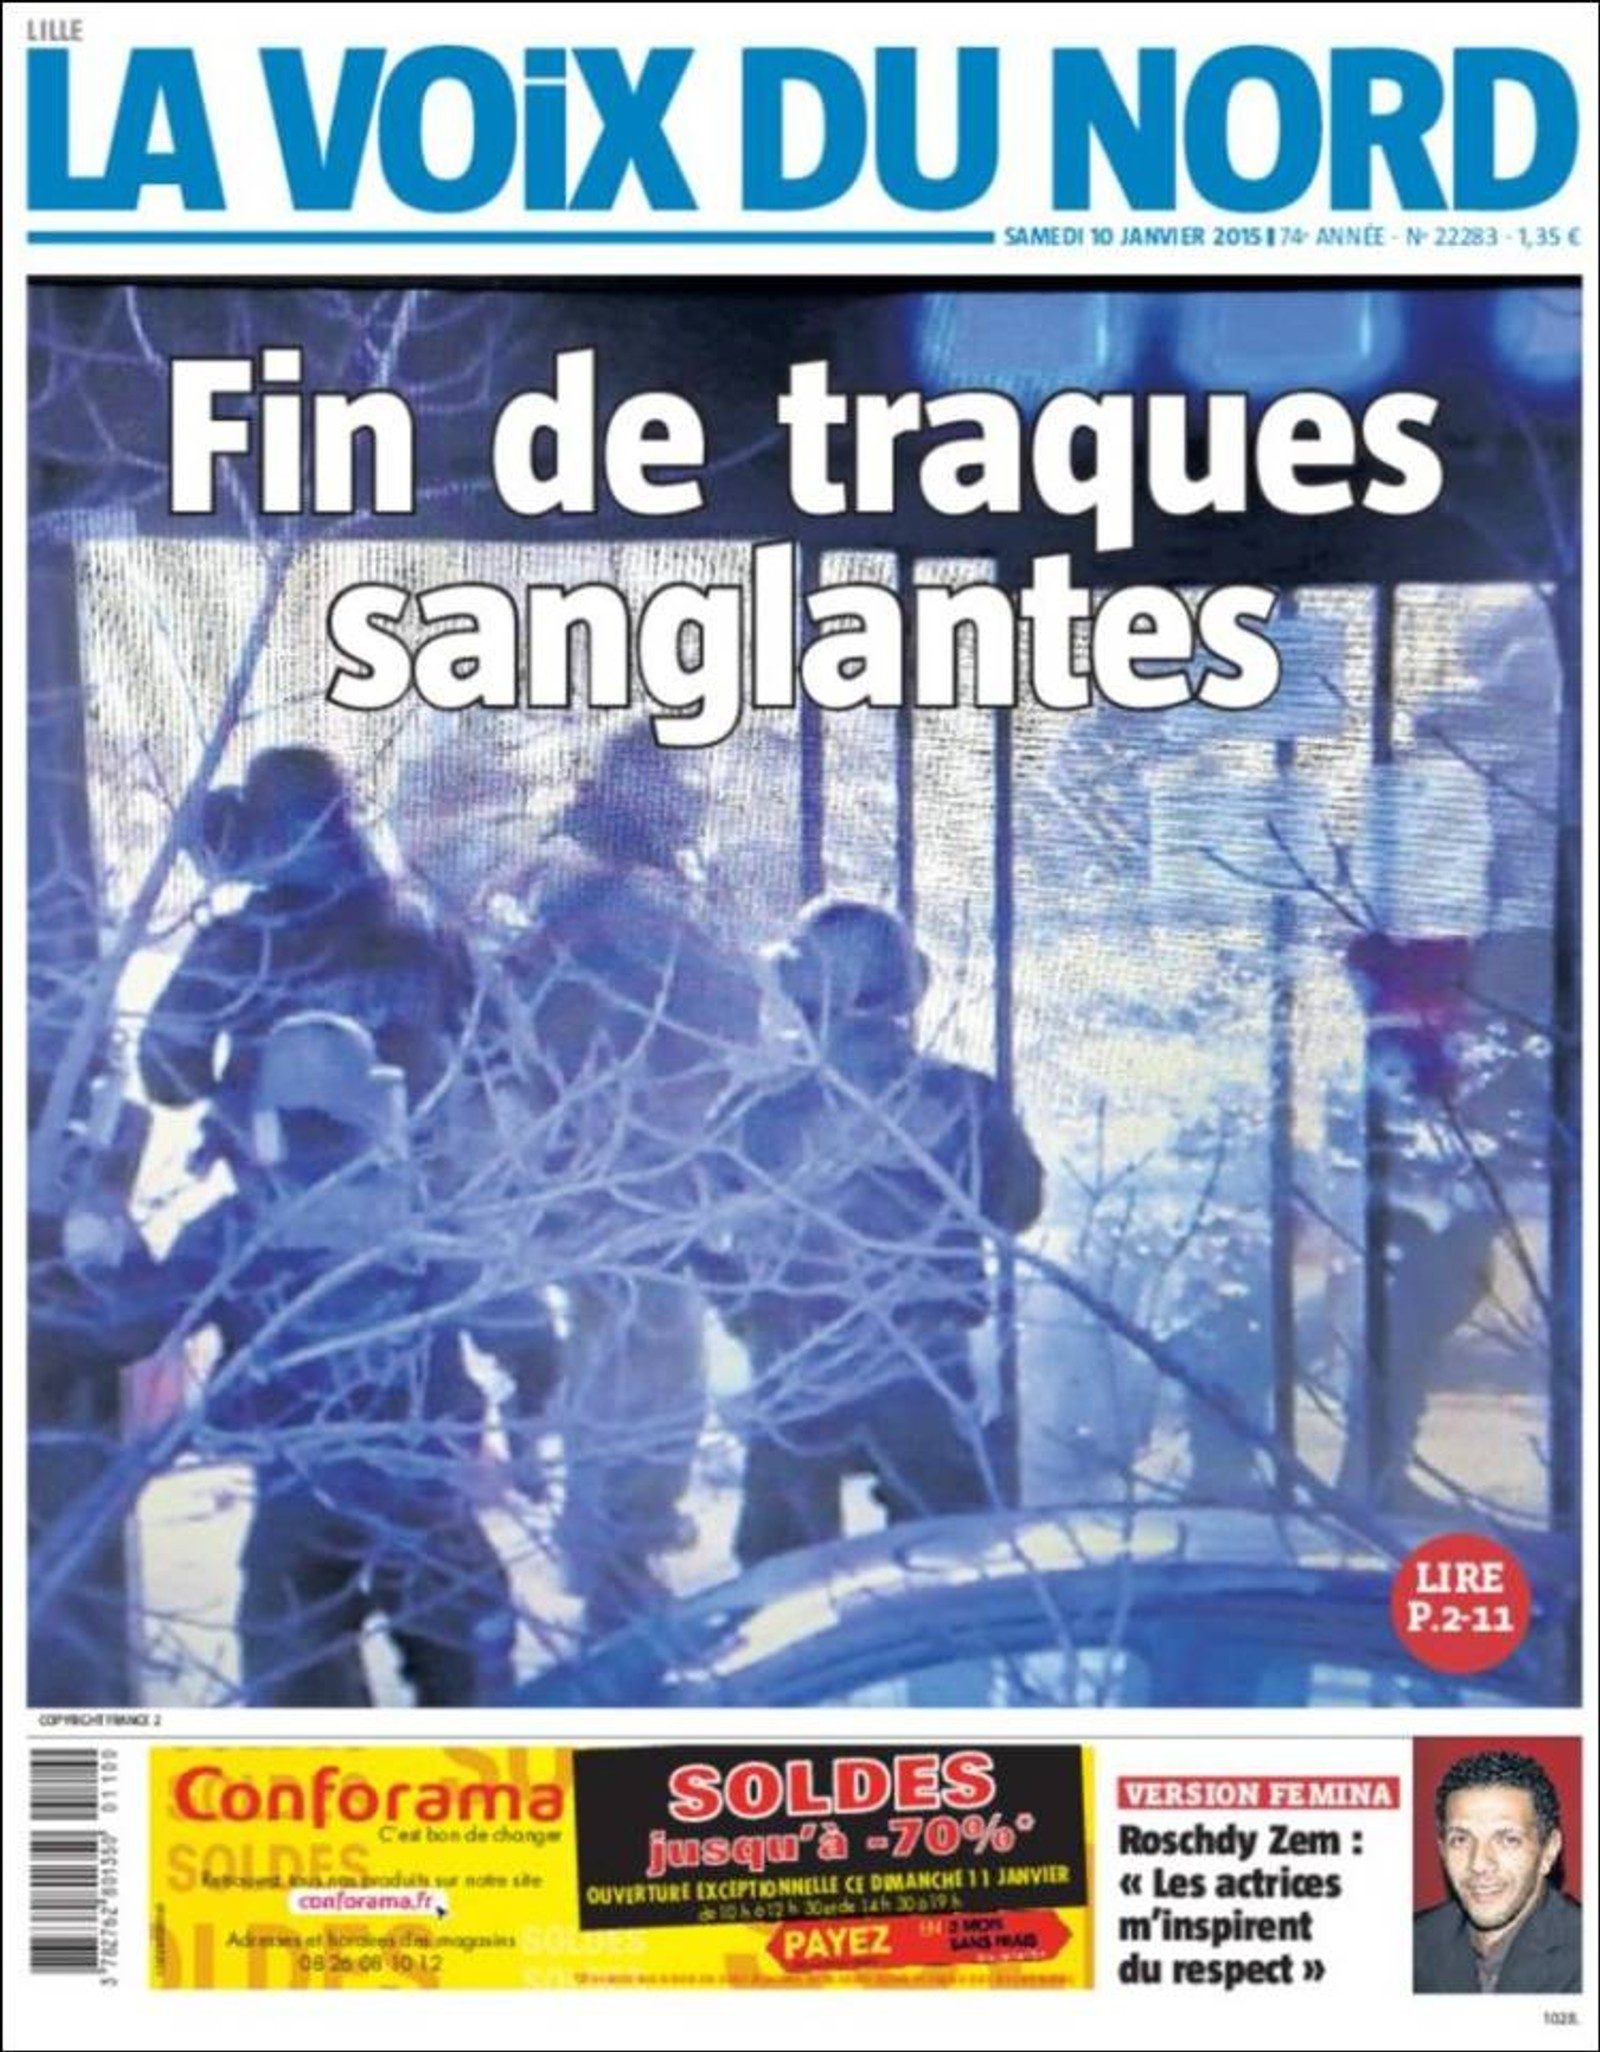 La Voix du Nord: Slutten på den blodige klappjakten.